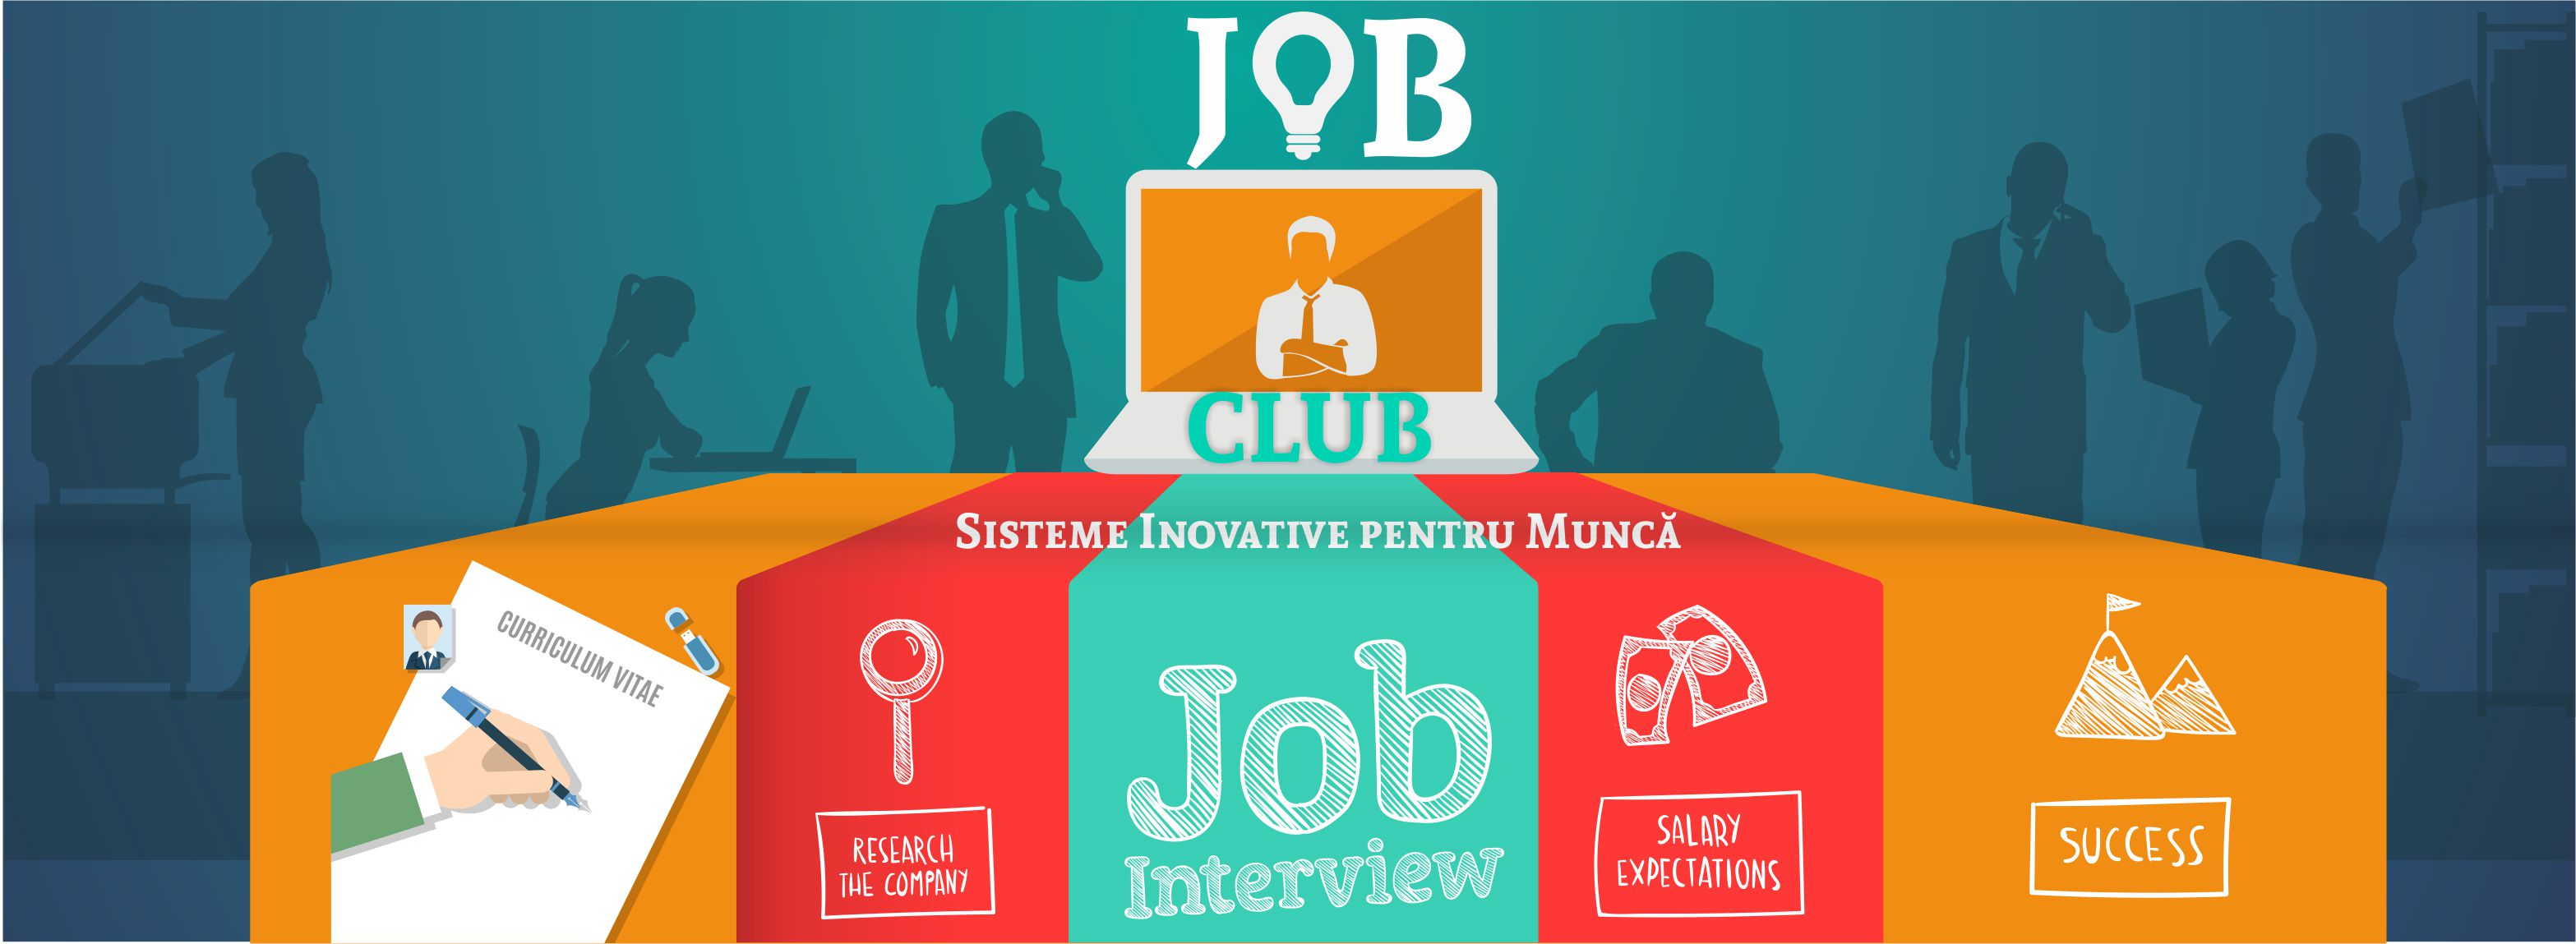 banner-job-club